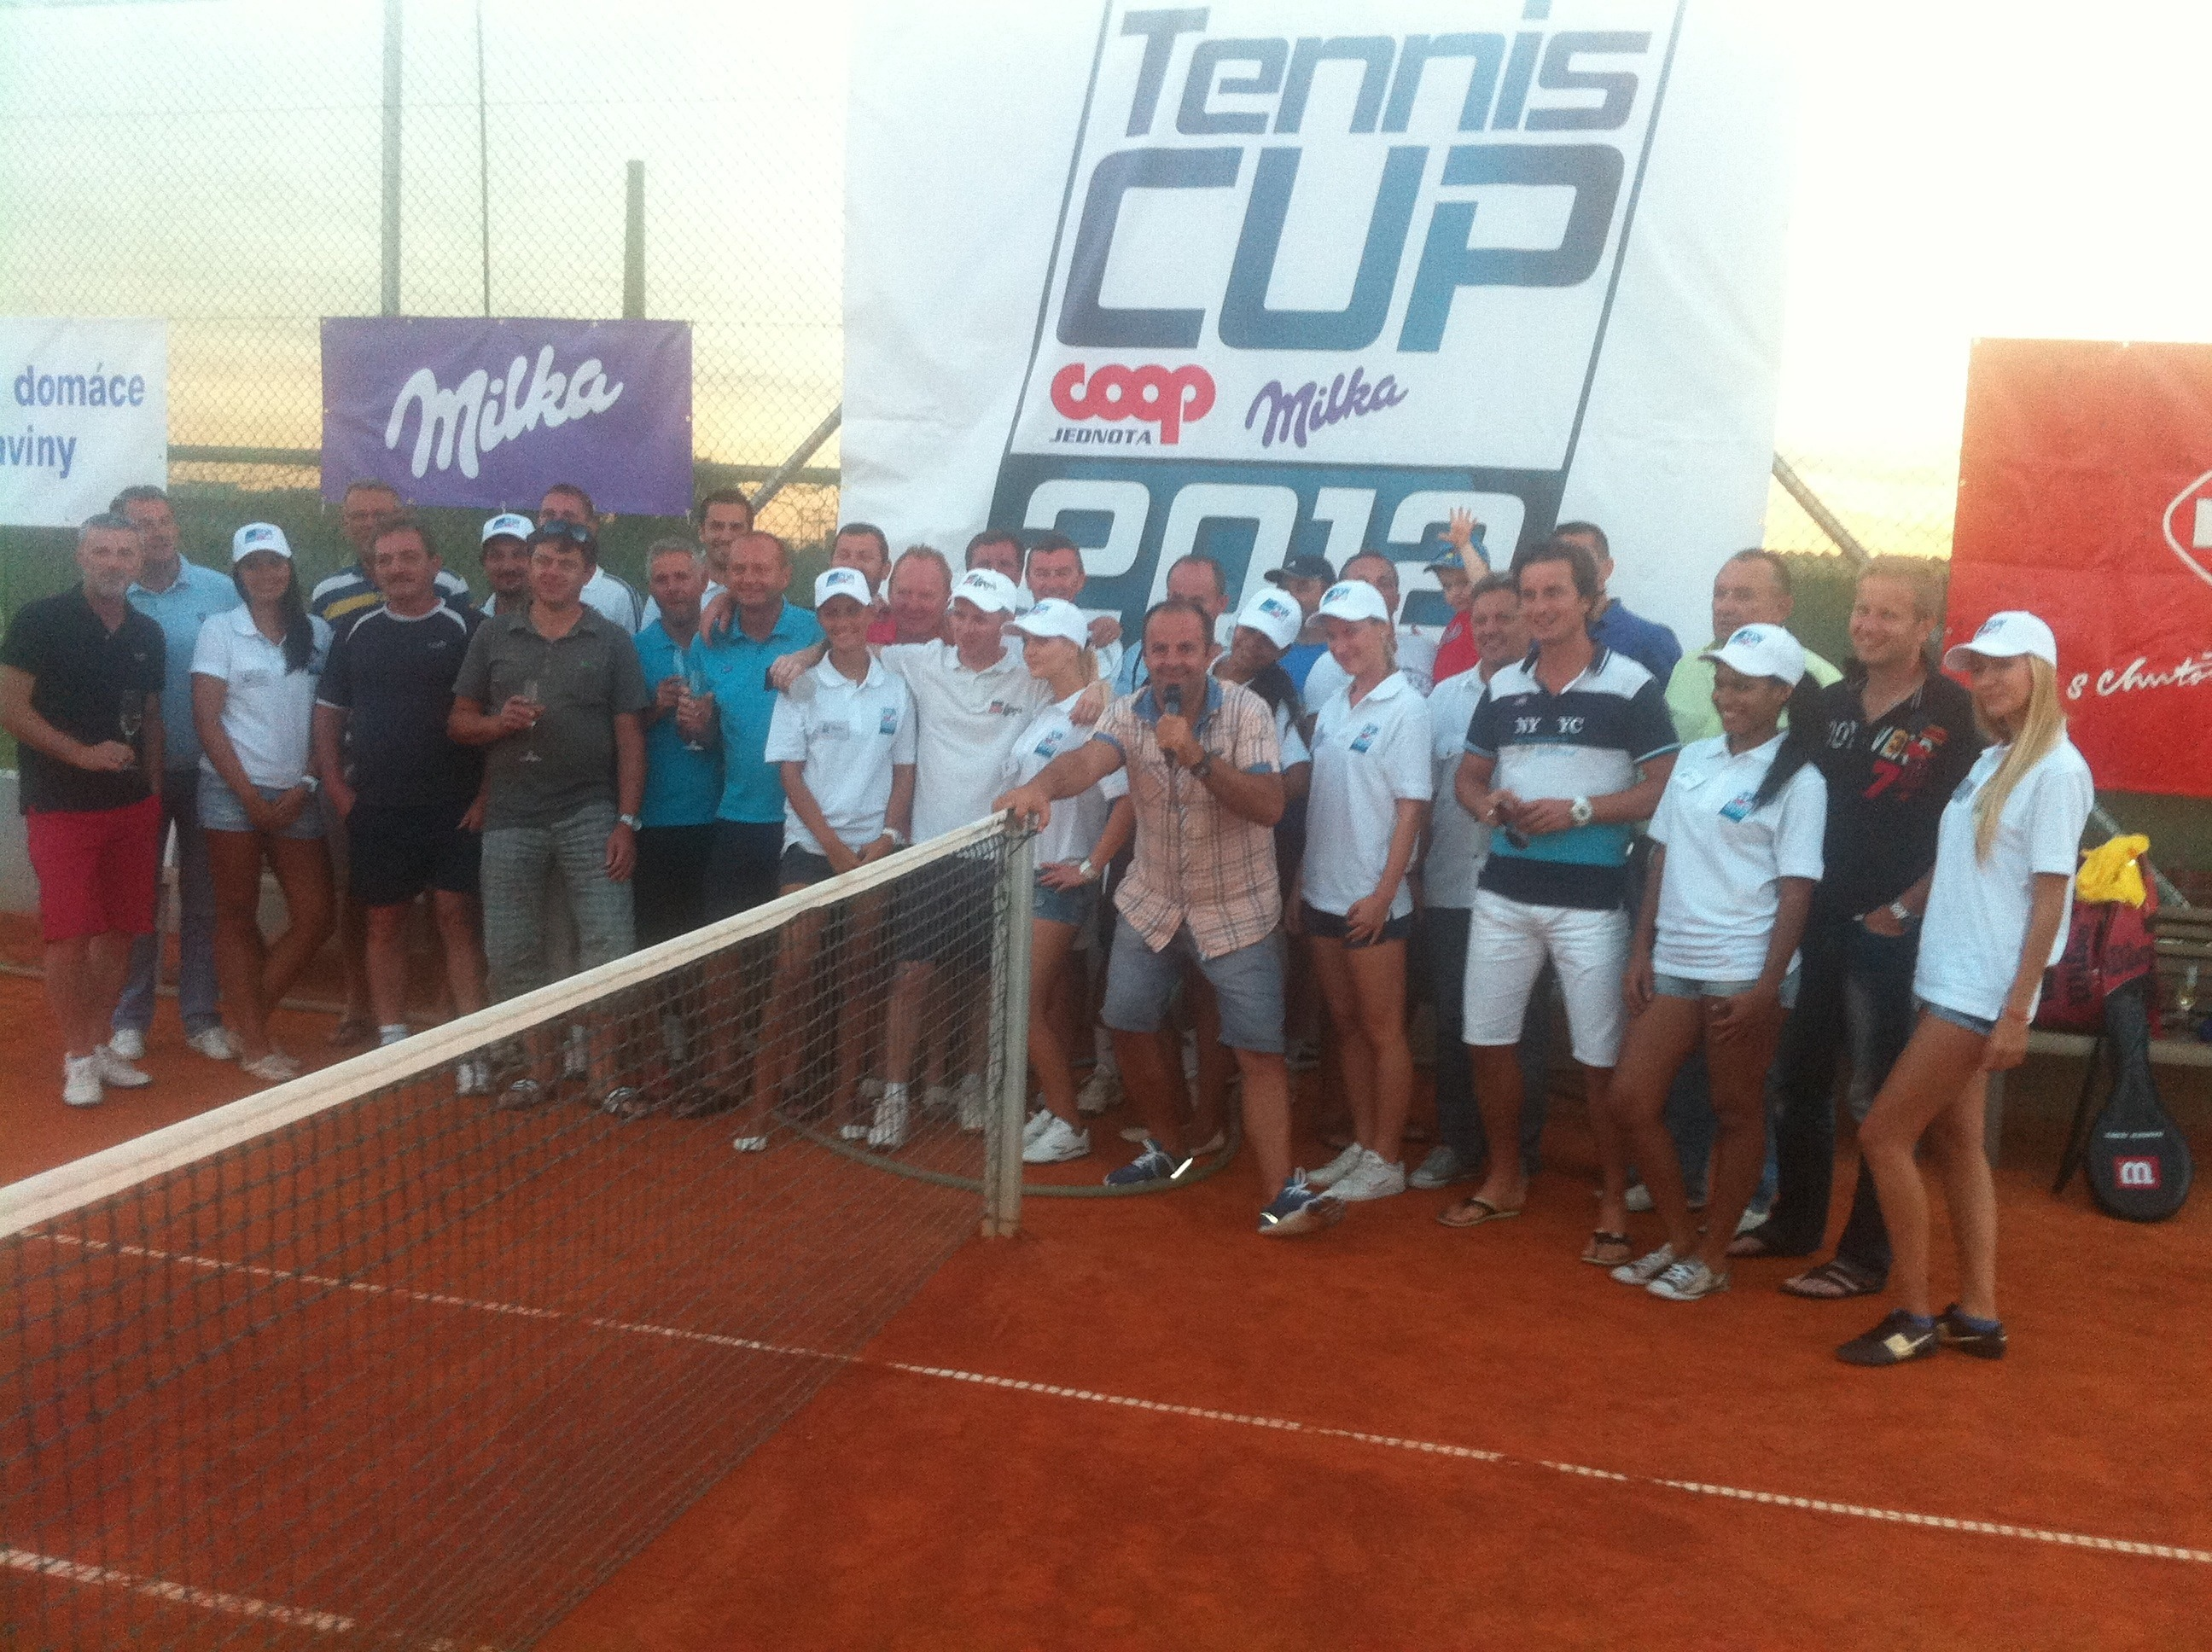 Tenis cup Coop Jednota Slovensko 2012 v hoteli Empire. 28. August, 2012. Trnava.